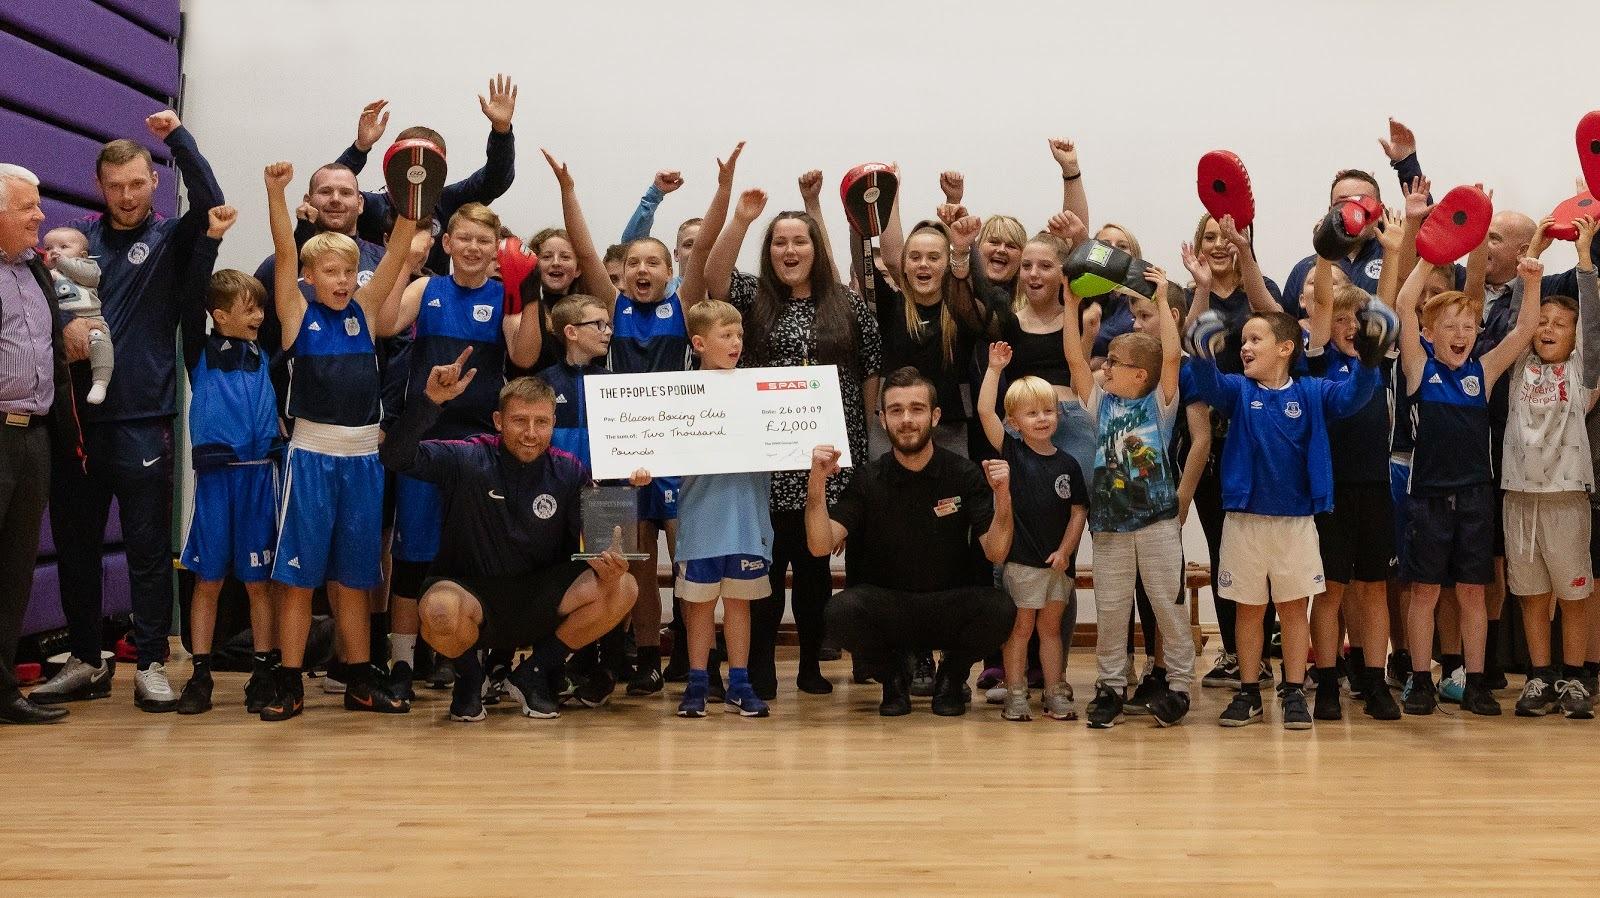 Blacon Boxing Club founder wins Spar community sport accolade